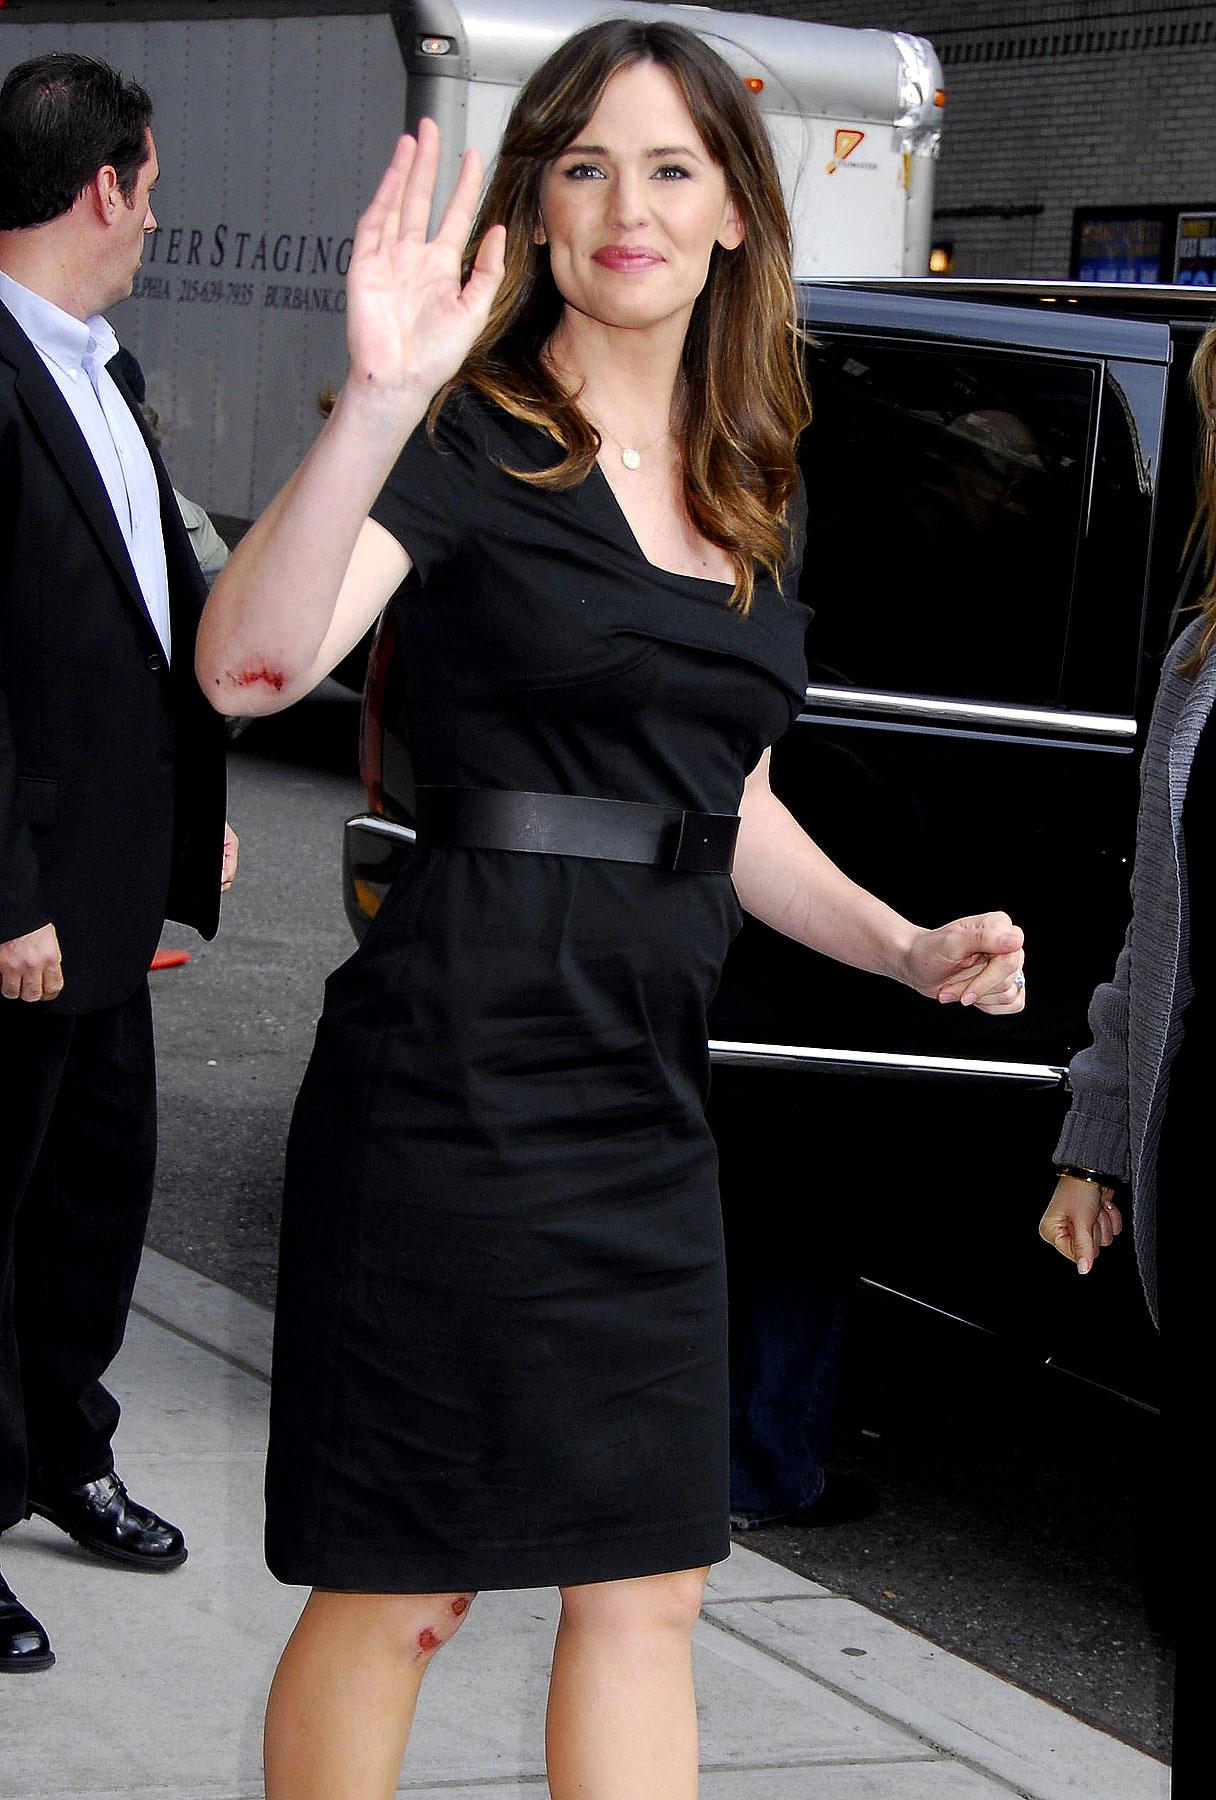 Jennifer Garner Gets the David Letterman Treatment